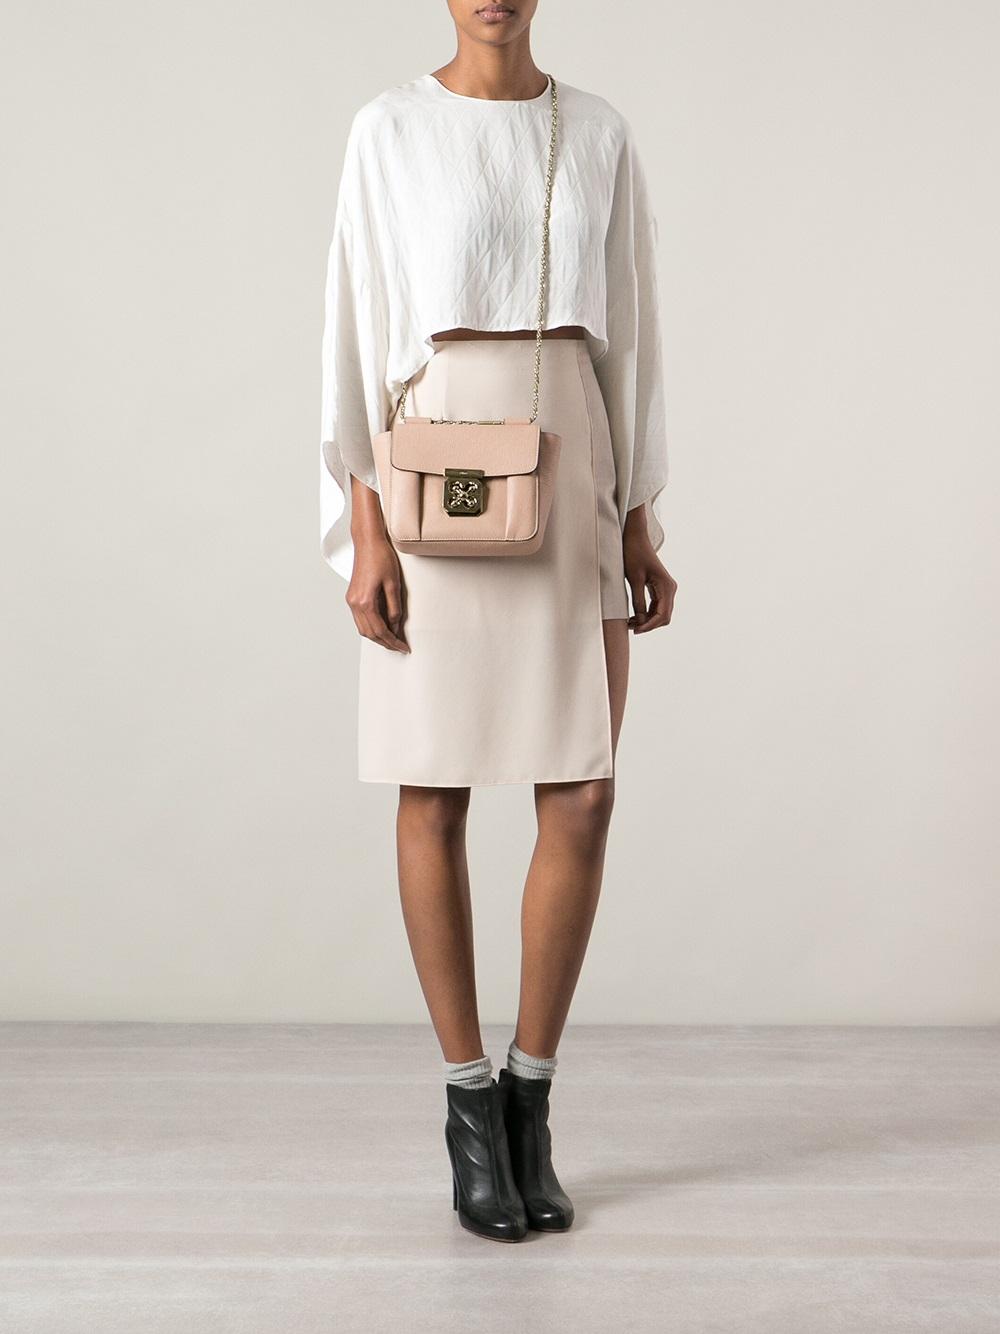 Chlo�� Small \u0026#39;Elsie\u0026#39; Shoulder Bag in Pink (nude \u0026amp; neutrals) | Lyst